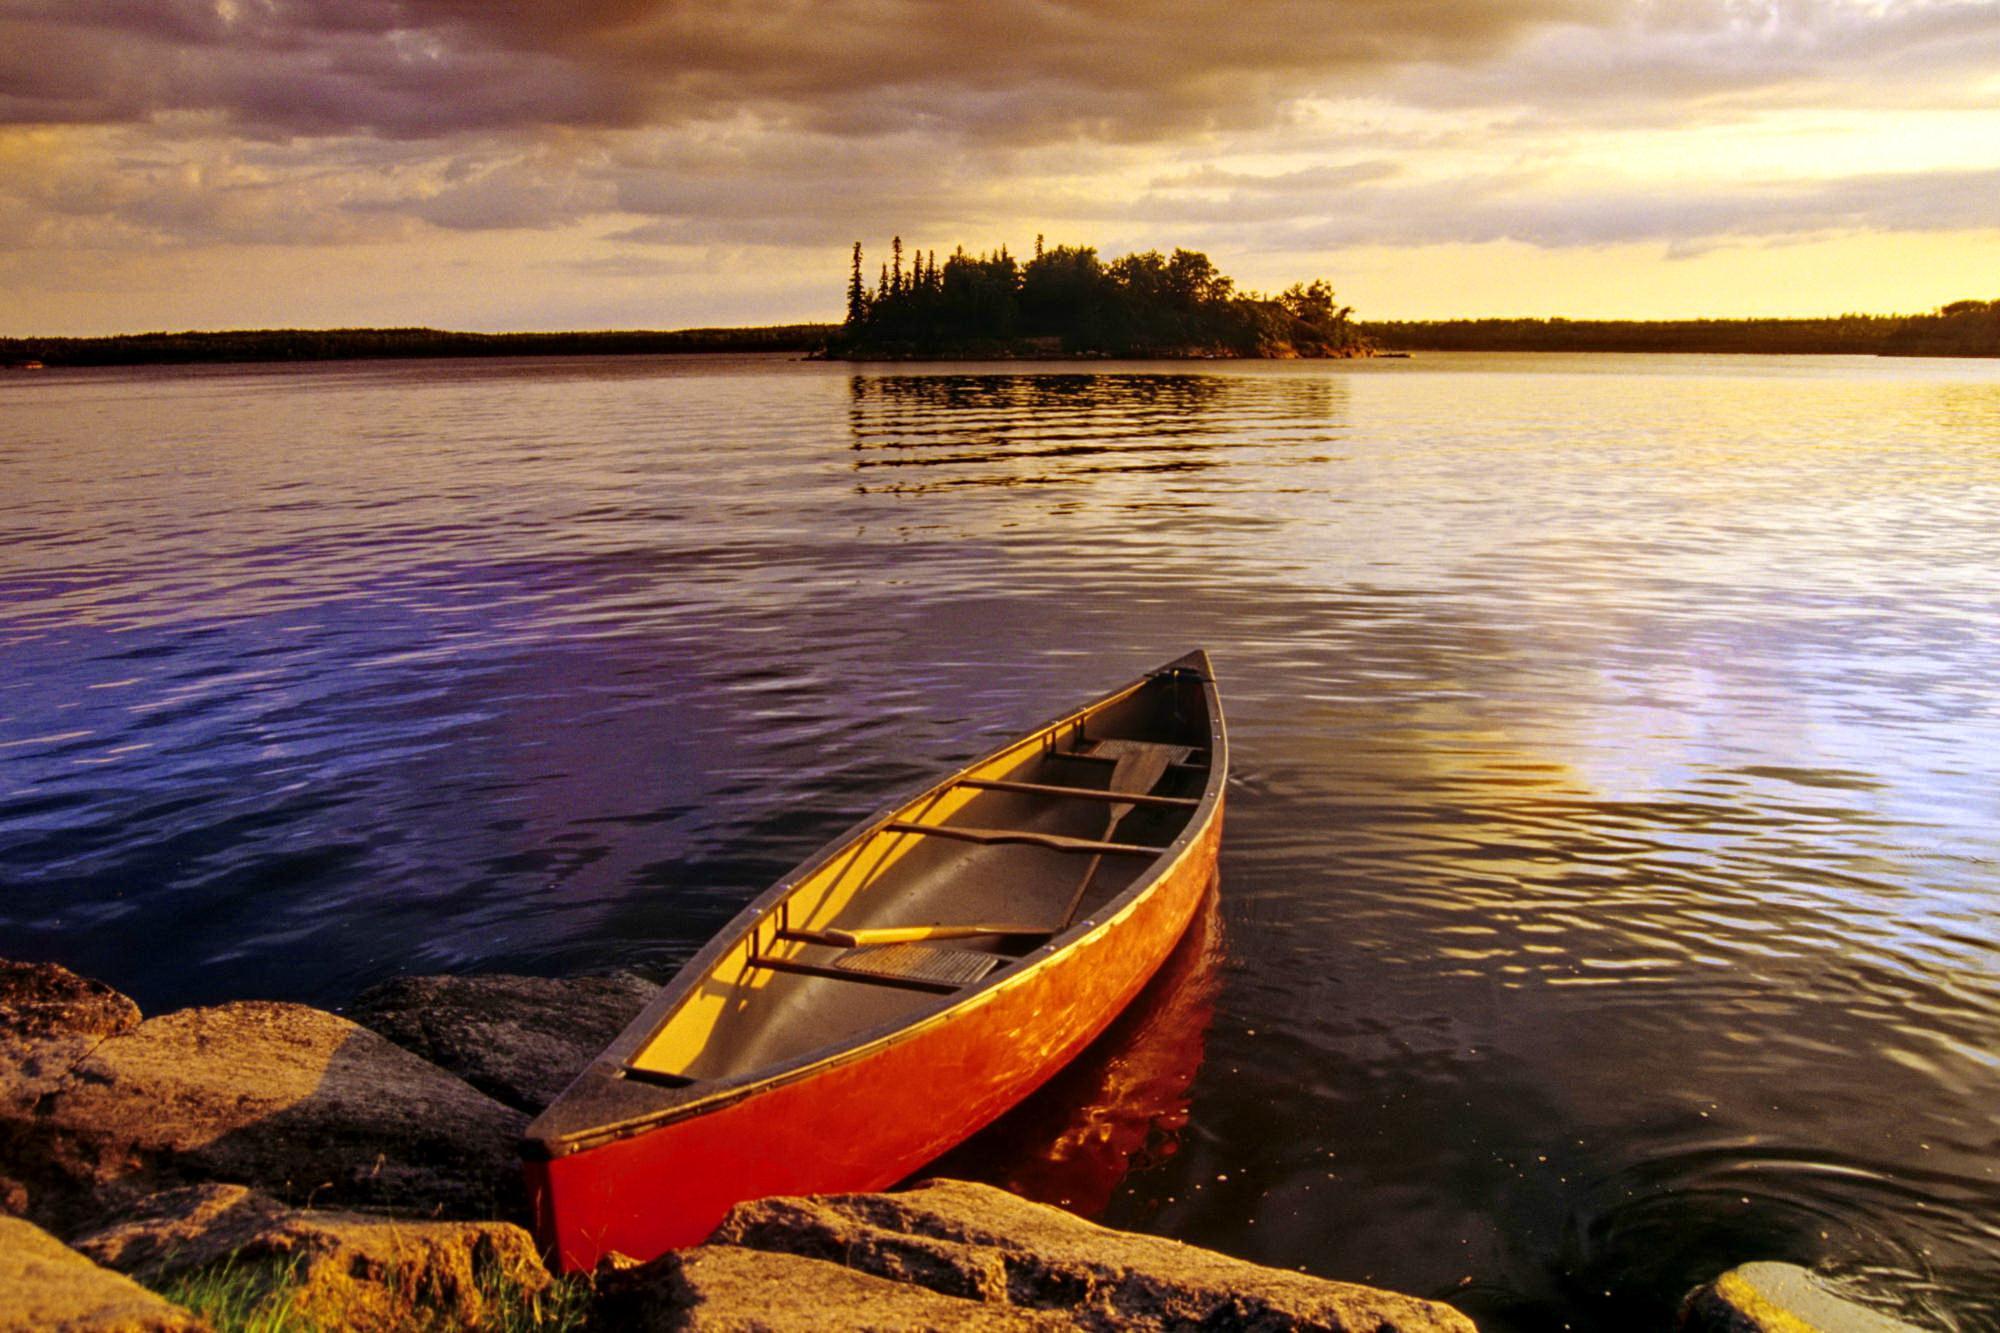 canoe-in-canadian-lake